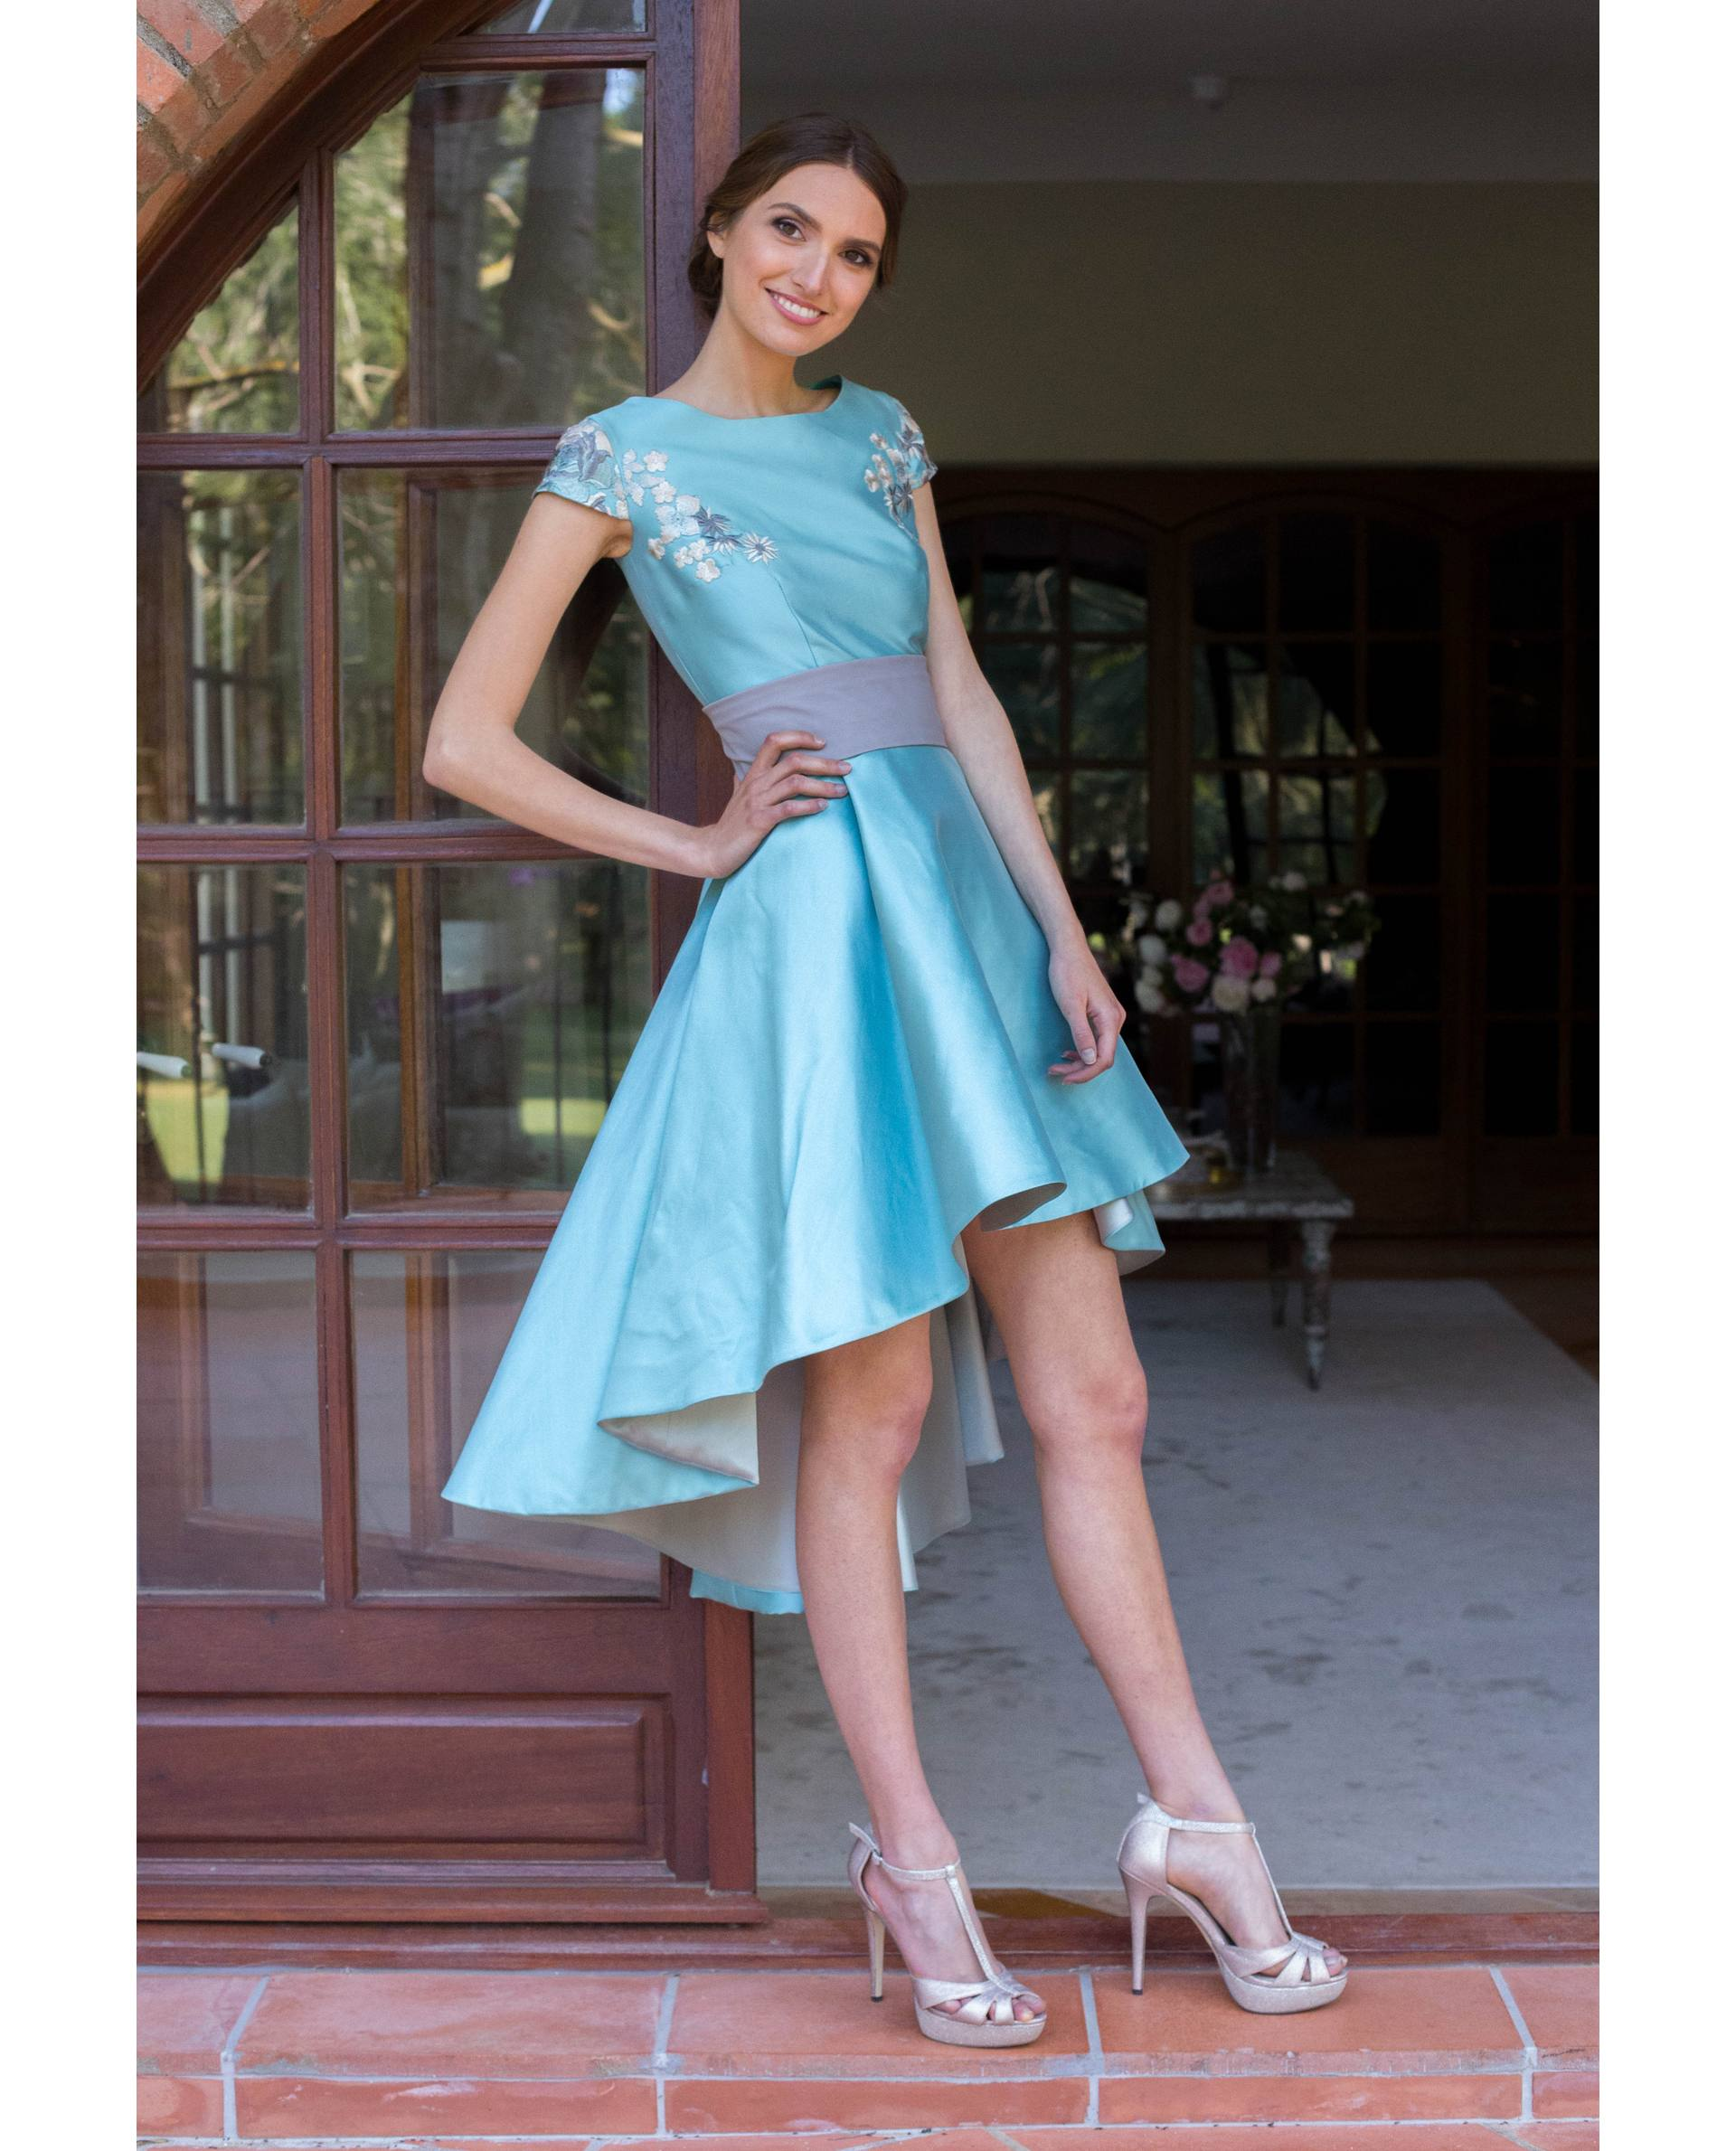 ATELIER-NATURE 2017/18 - VESTIDOS - vestido fiesta LIA azul